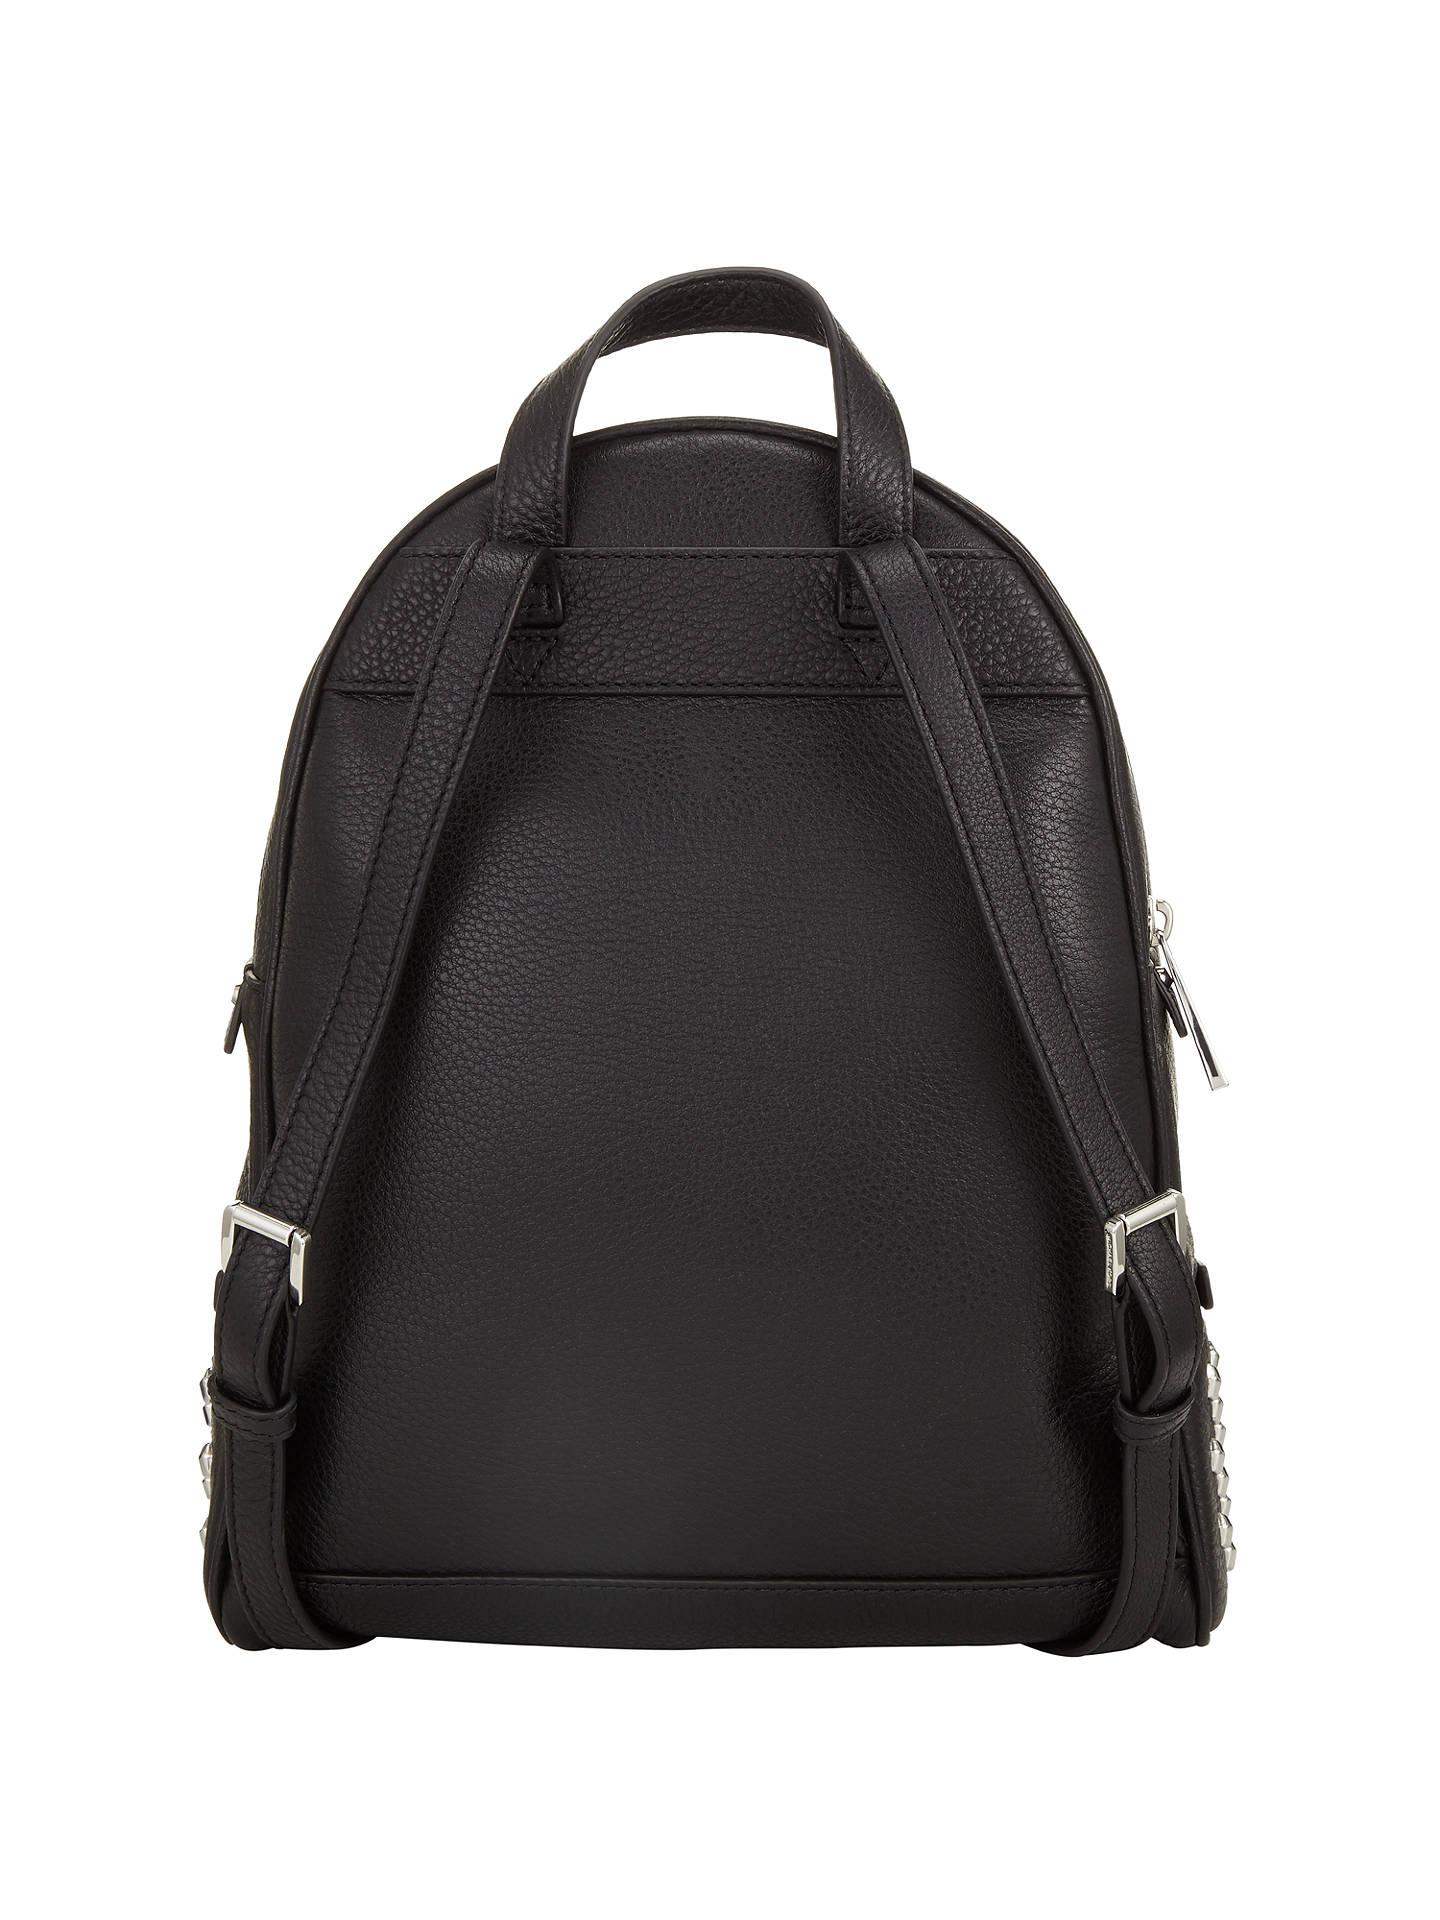 63fc2b2423d3 ... Buy MICHAEL Michael Kors Rhea Leather Studded Backpack